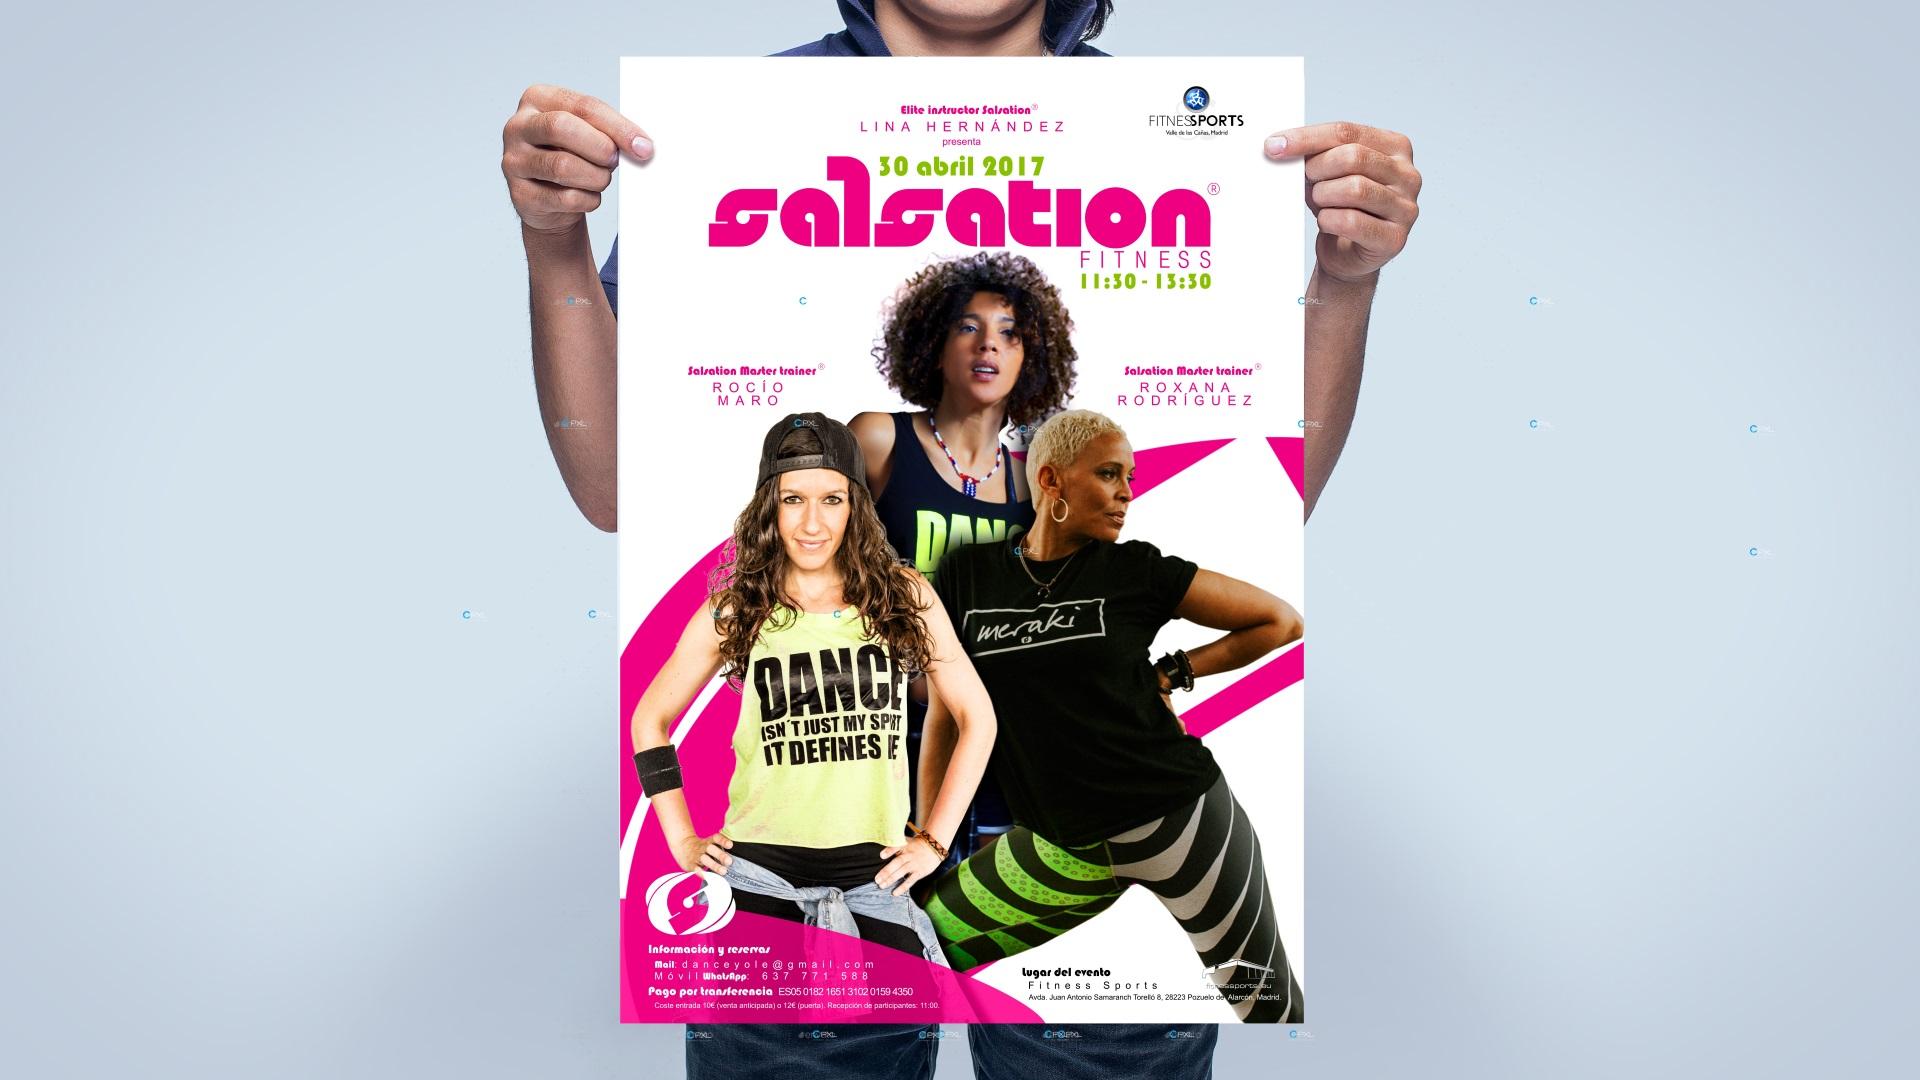 https://perfectpixel.es/wp-content/uploads/2017/04/Salsation-Fitness-Dise%C3%B1o-CArtel-PerfectPixel-Publicidad-Agencia-de-Publicidad-en-Madrid-Cover.jpg